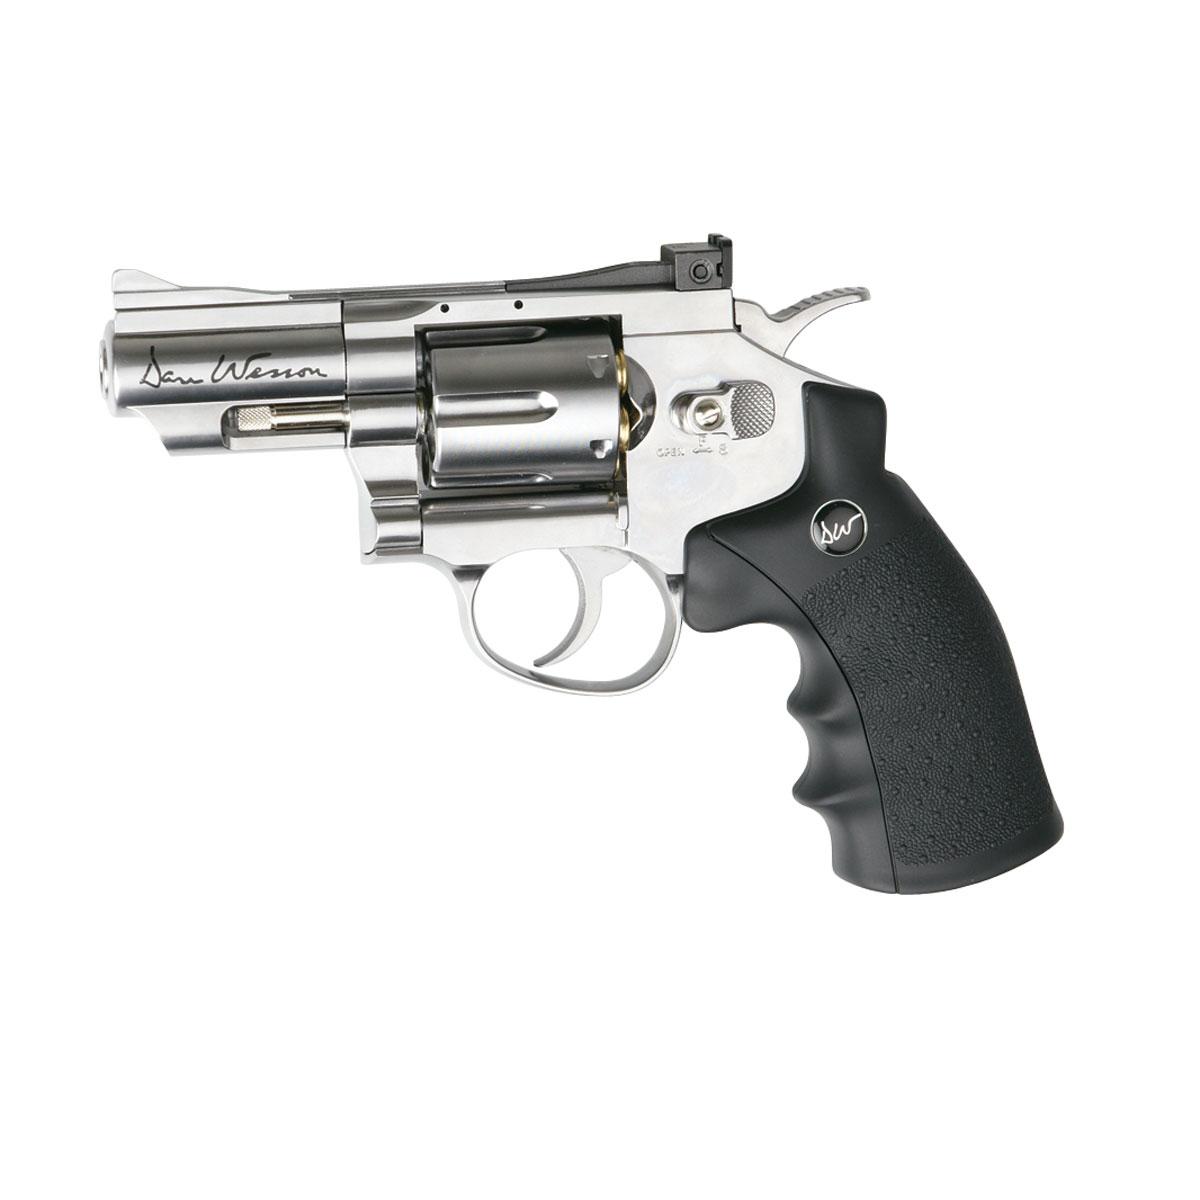 "ASG ""Dan Wesson 2.5inch"" револьвер пневматический CO2, 4,5 мм, цвет: Silver (17177)"